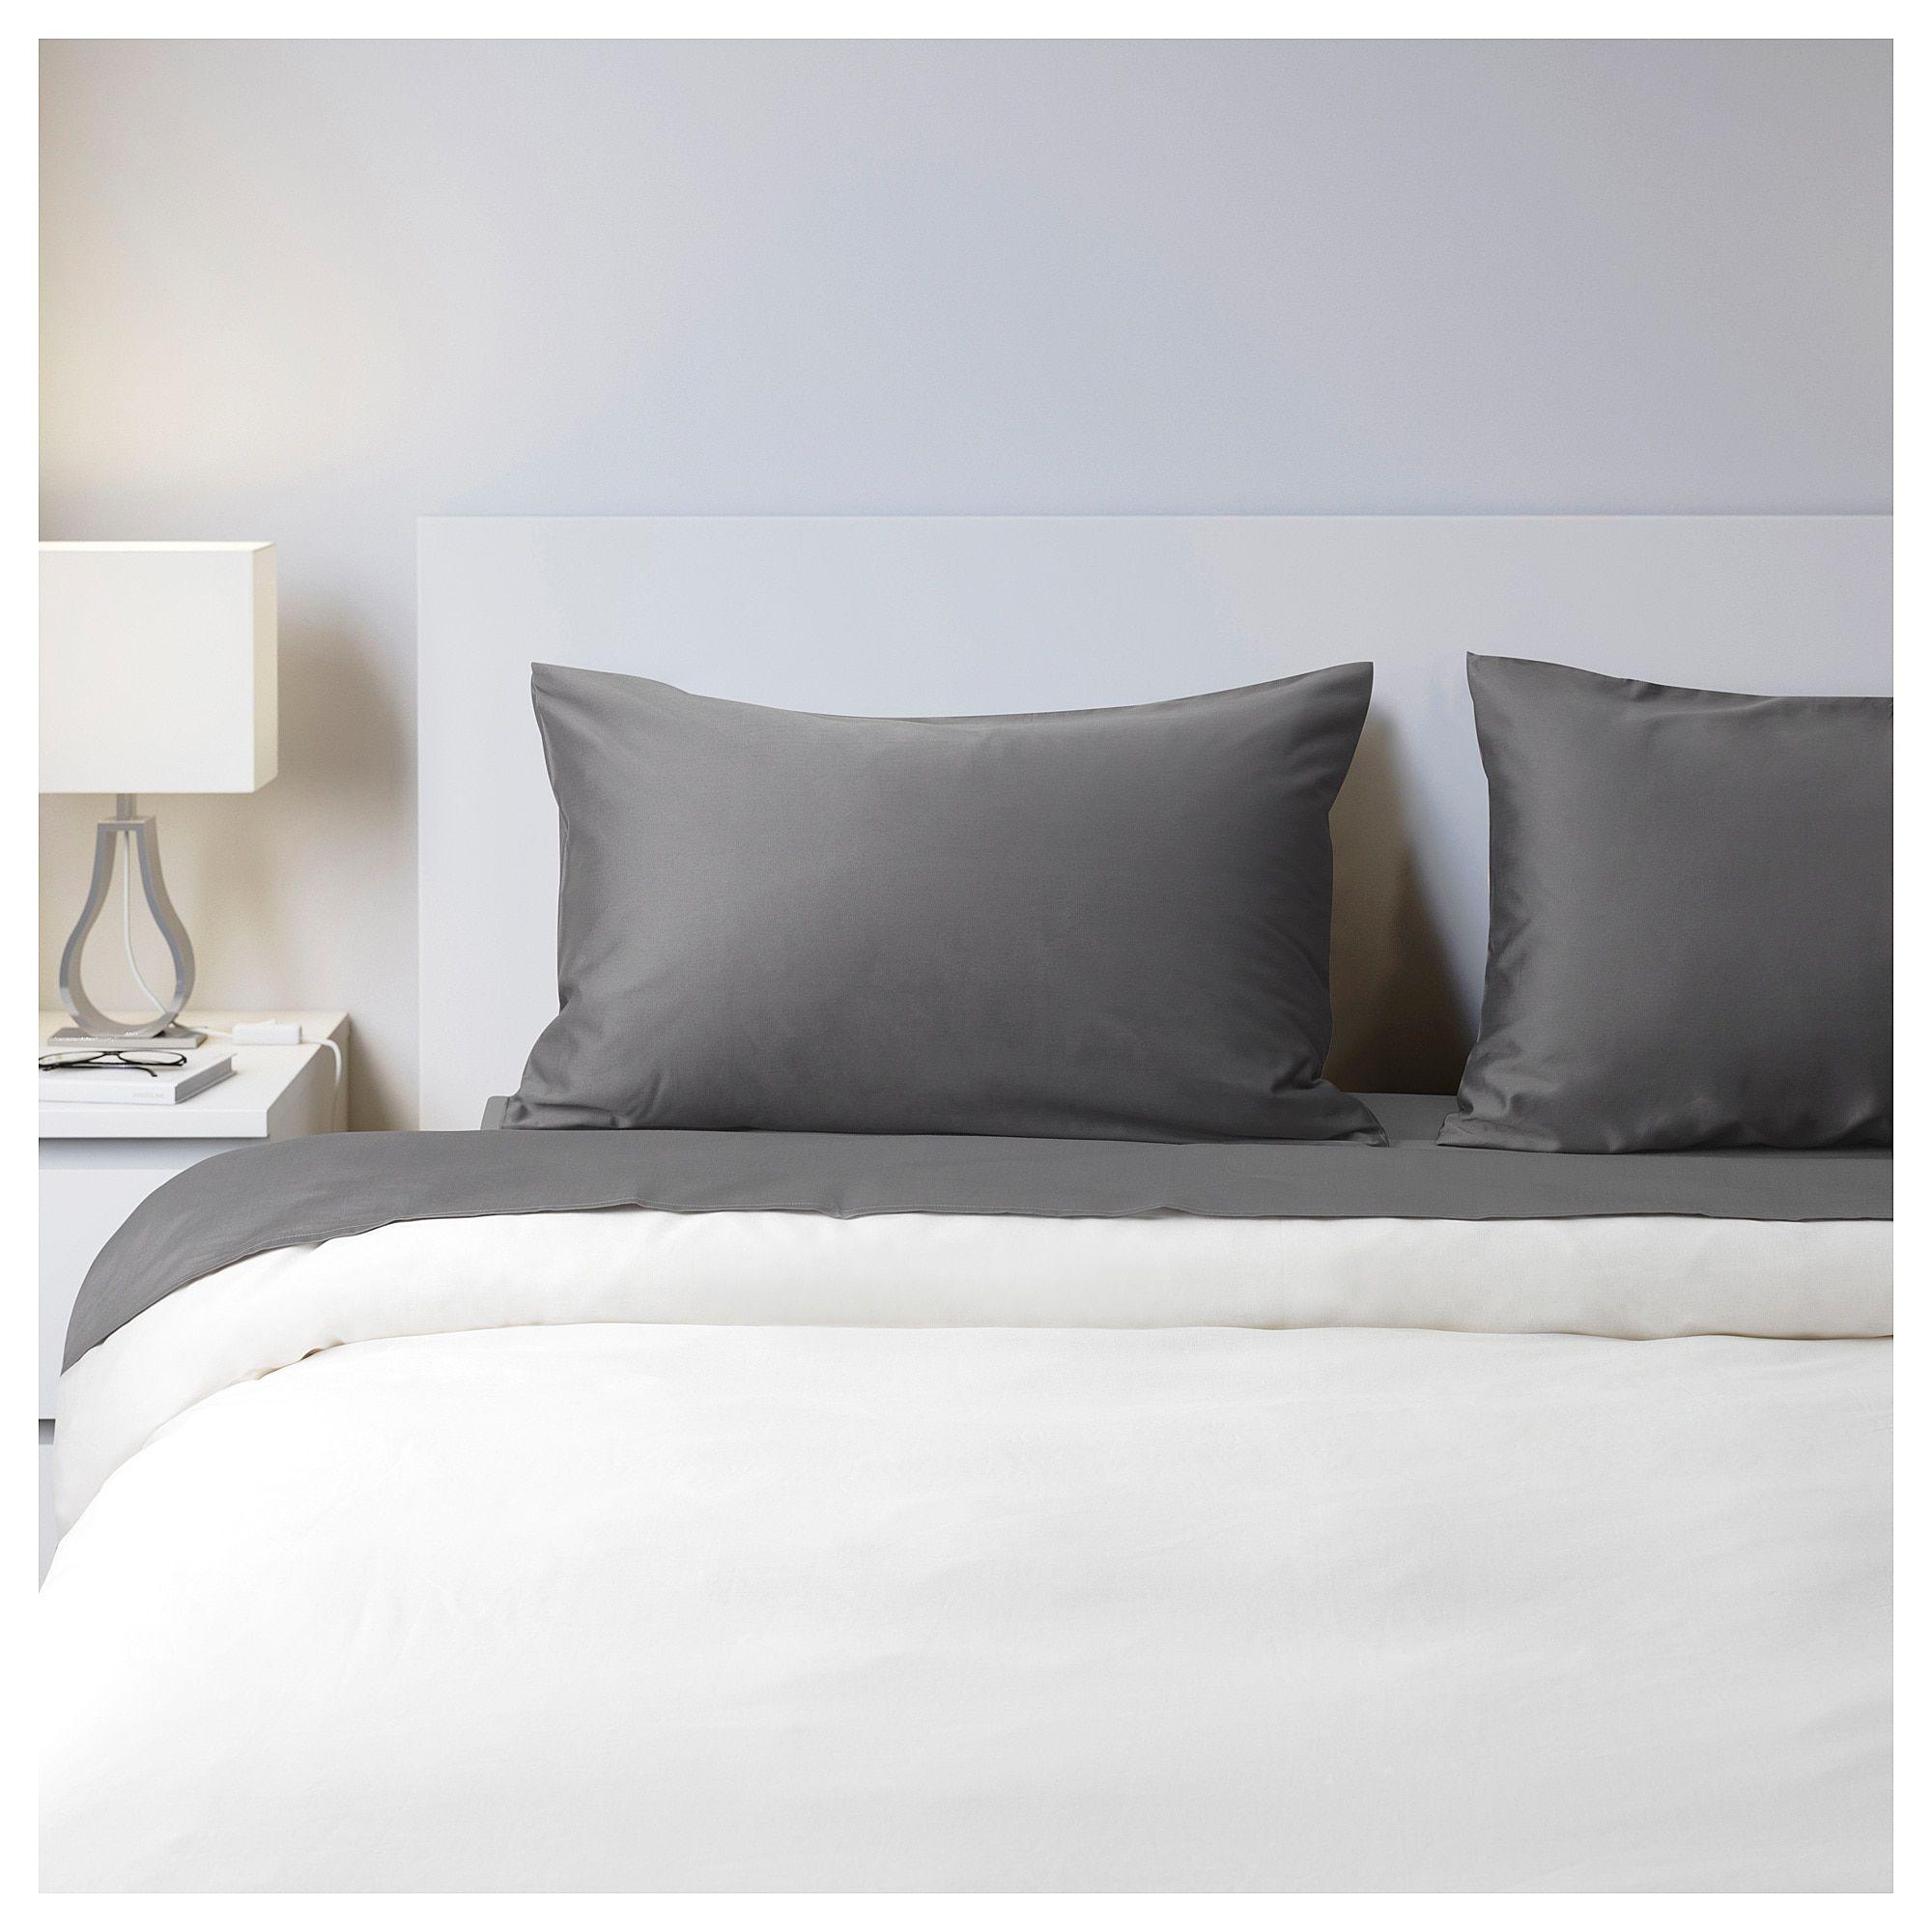 Okenstjarna Sheet Set Dark Gray Queen Ikea Grey Sheets King Flat Sheet Sheet Sets